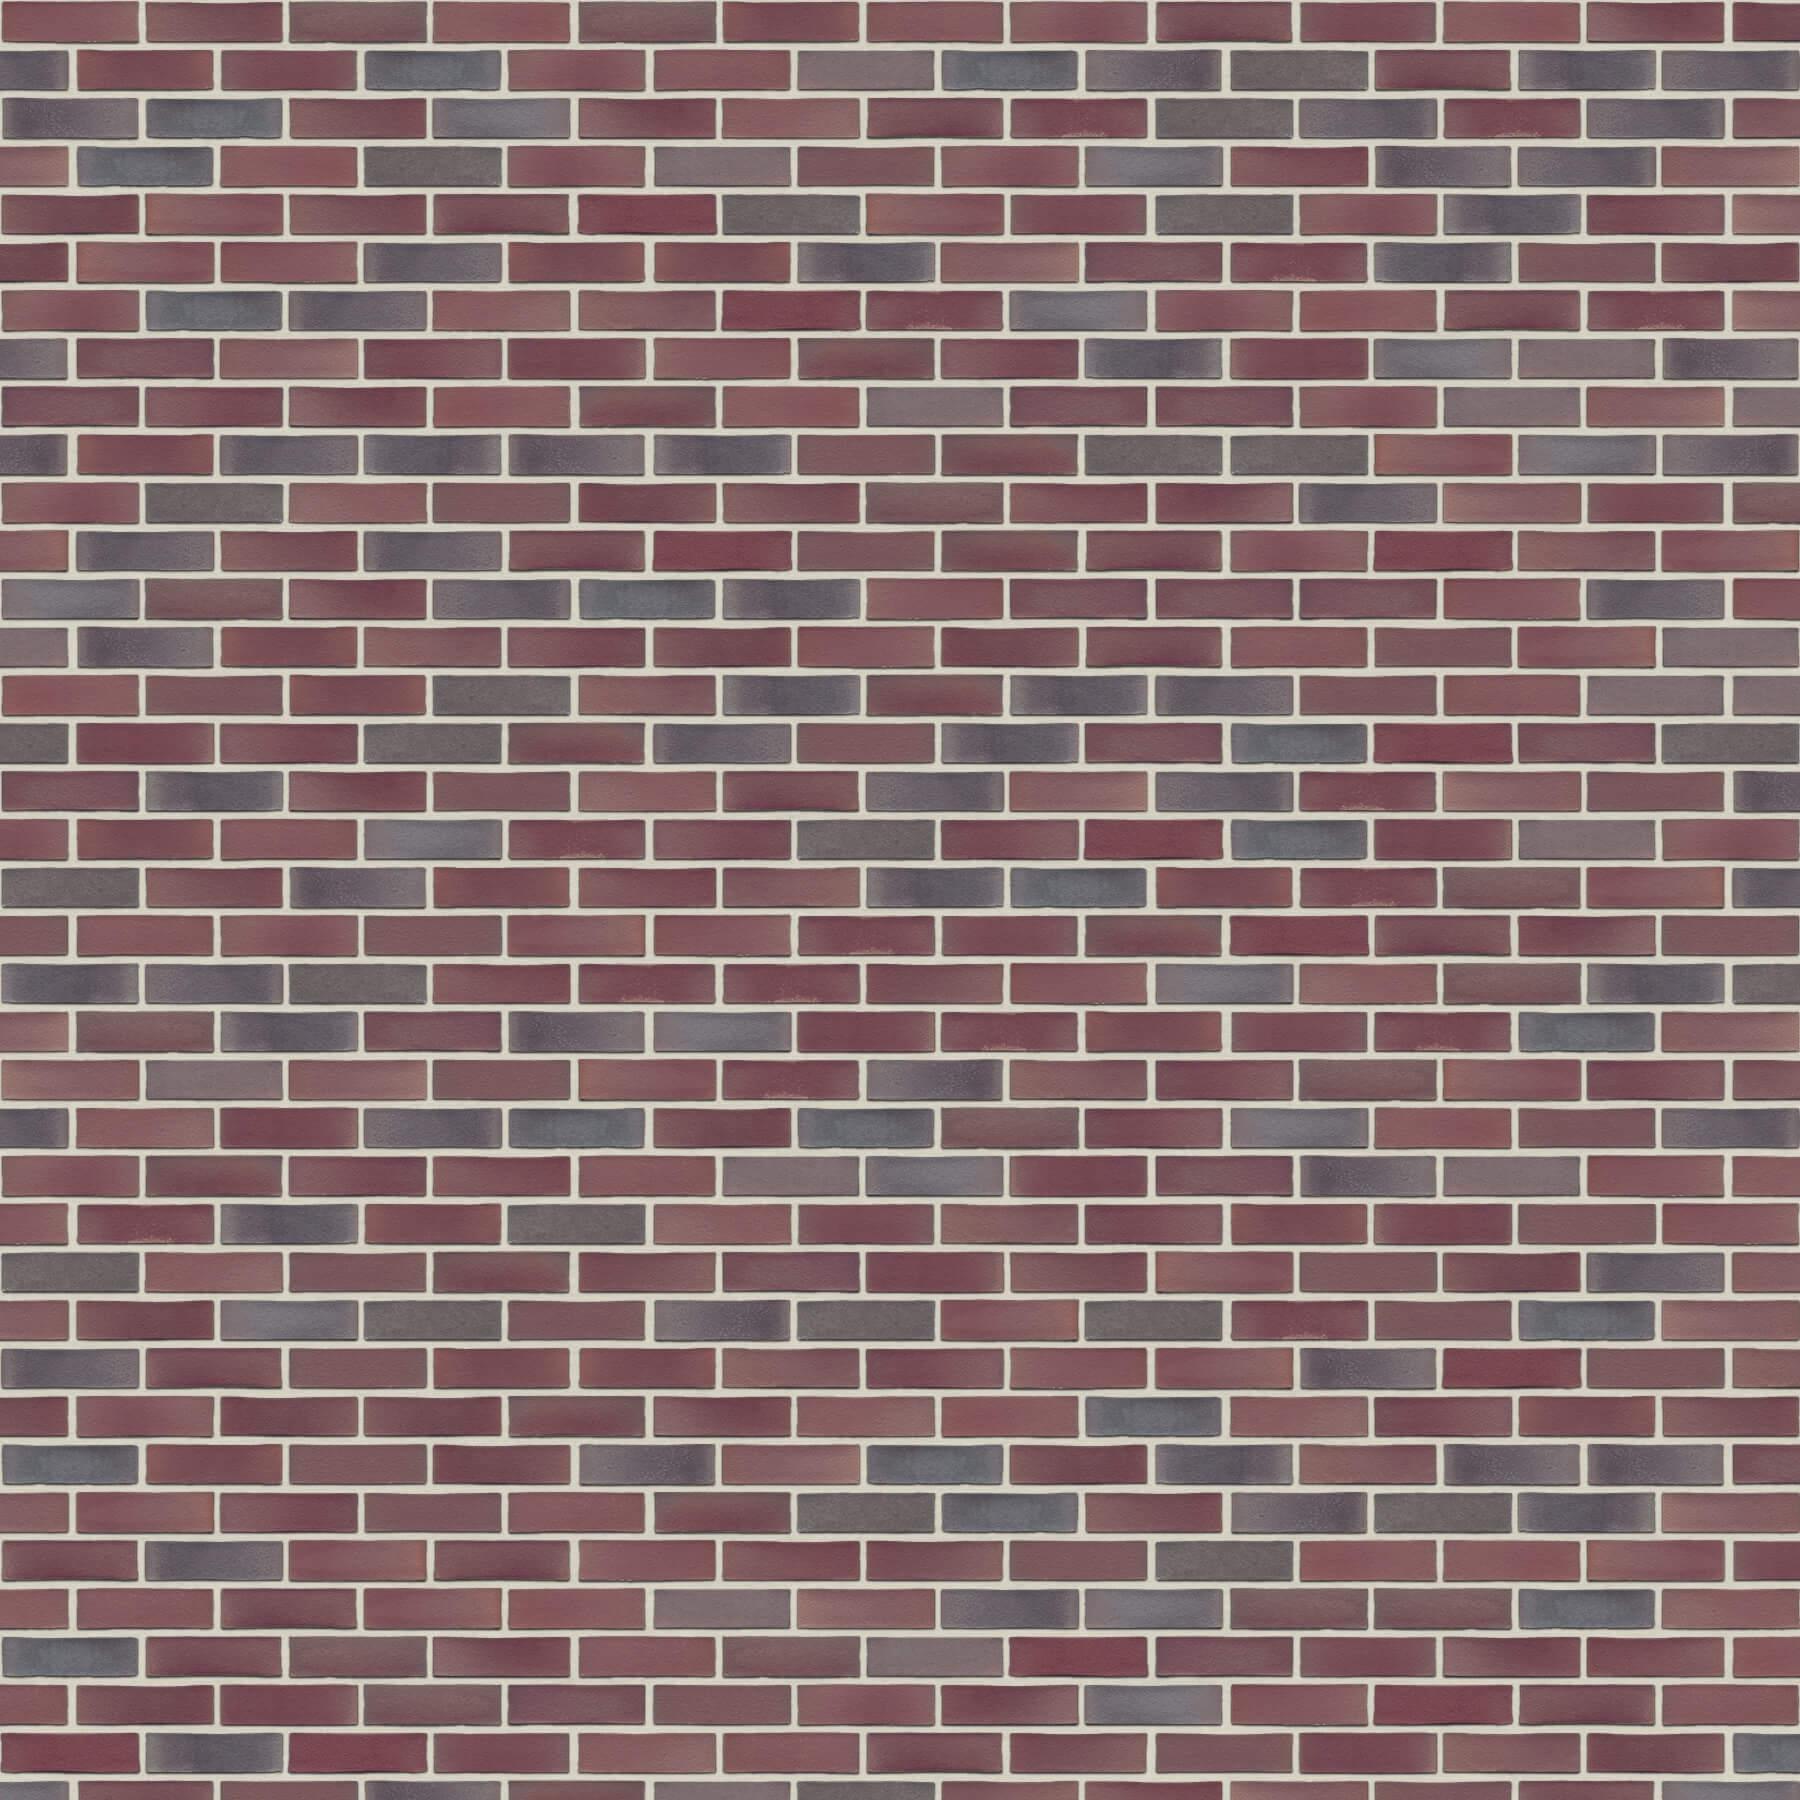 Puna-cigla-FeldHaus-Klinker-brick-ho-beograd-nf-k-380-Bela Fuga